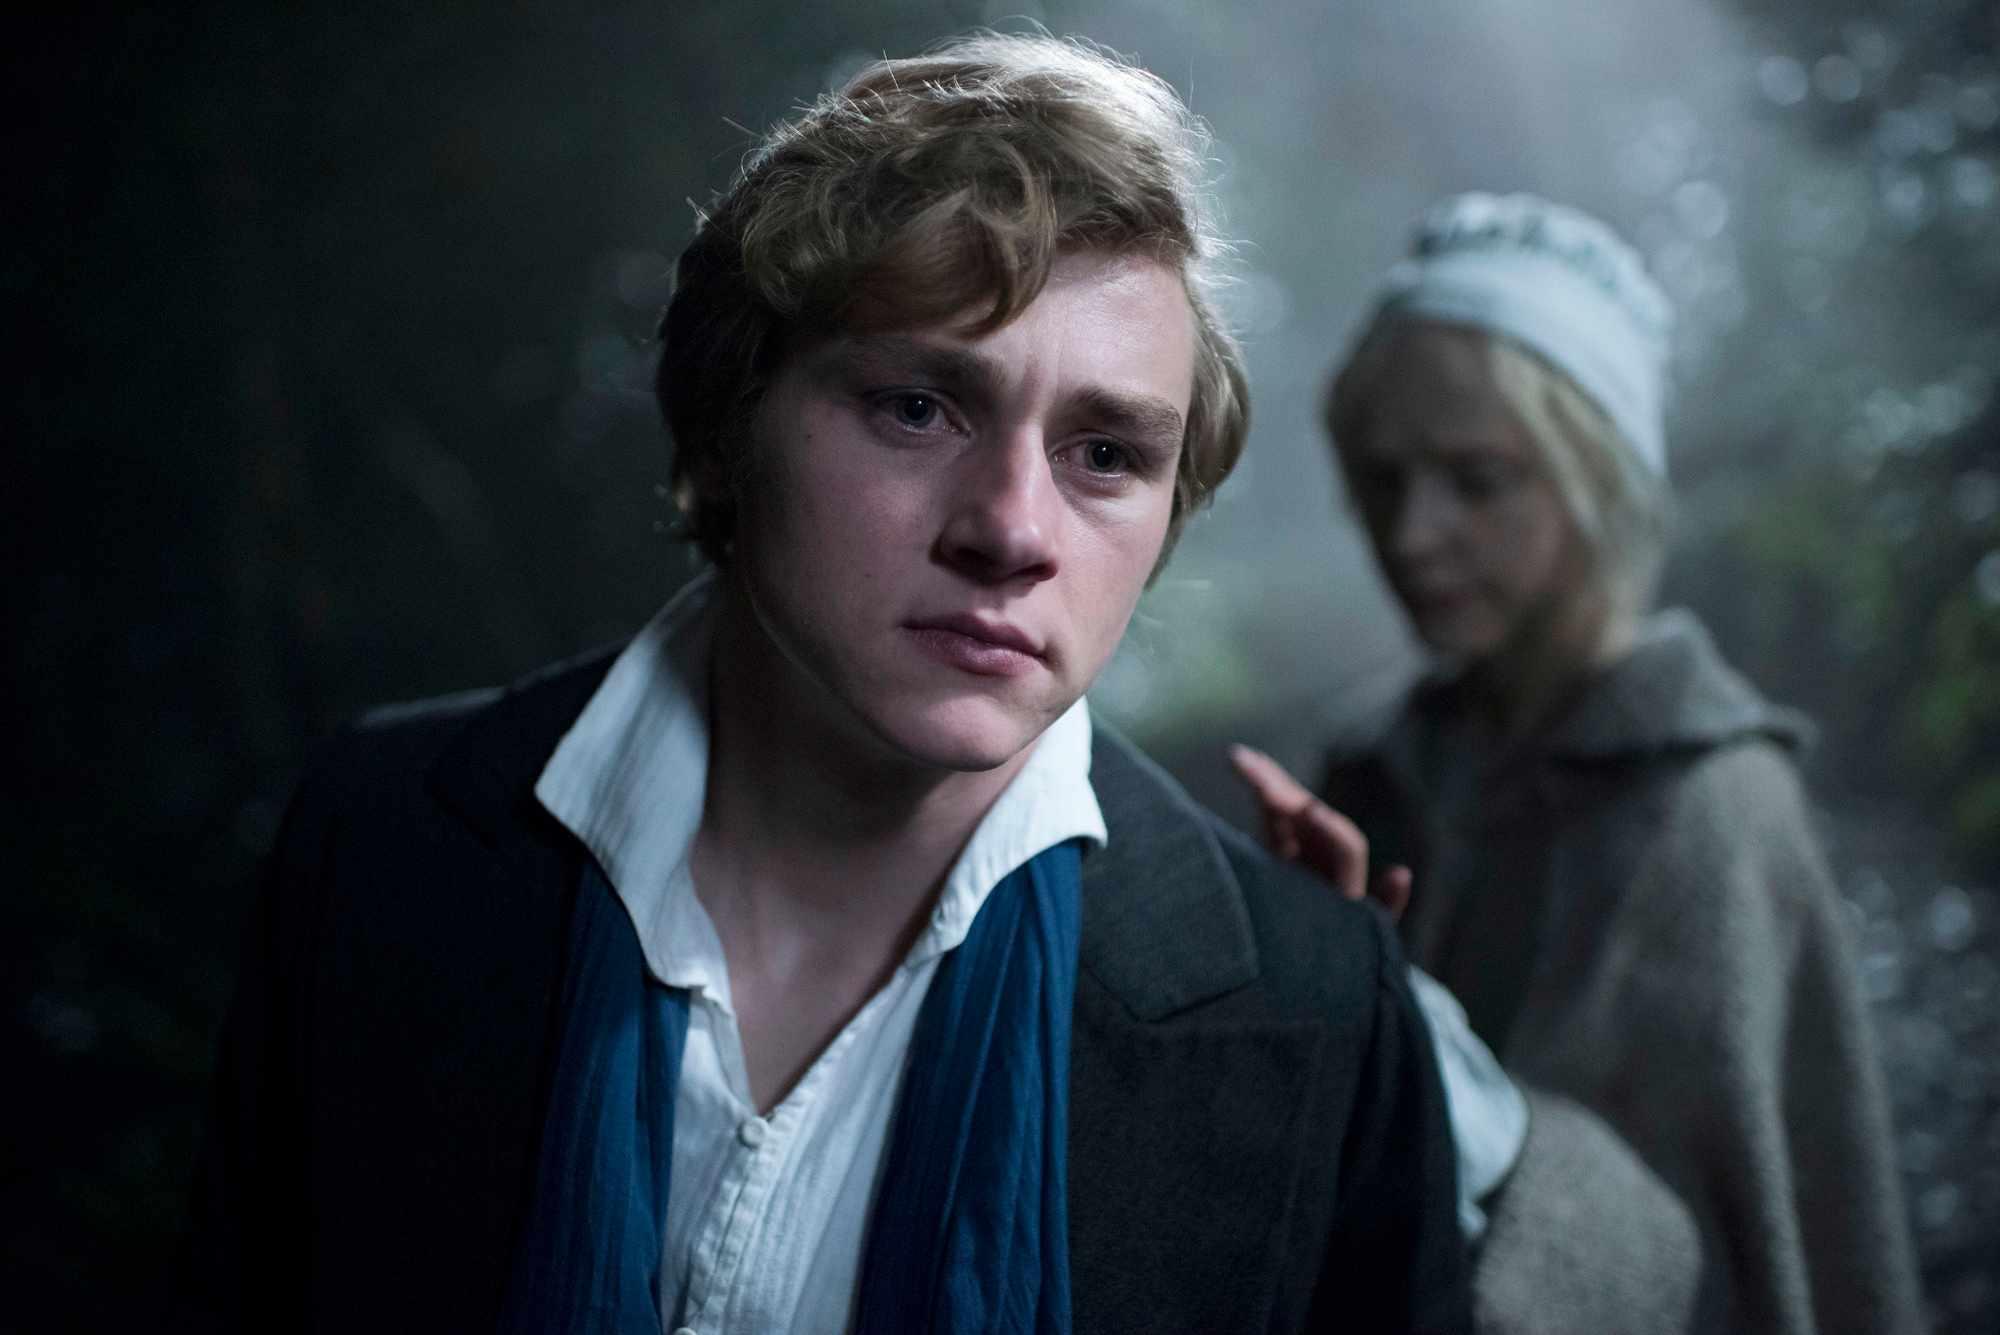 Walter (BEN HARDY), Anne (OLIVIA VINALL) - (C) Origin Pictures - Photographer: Steffan Hill